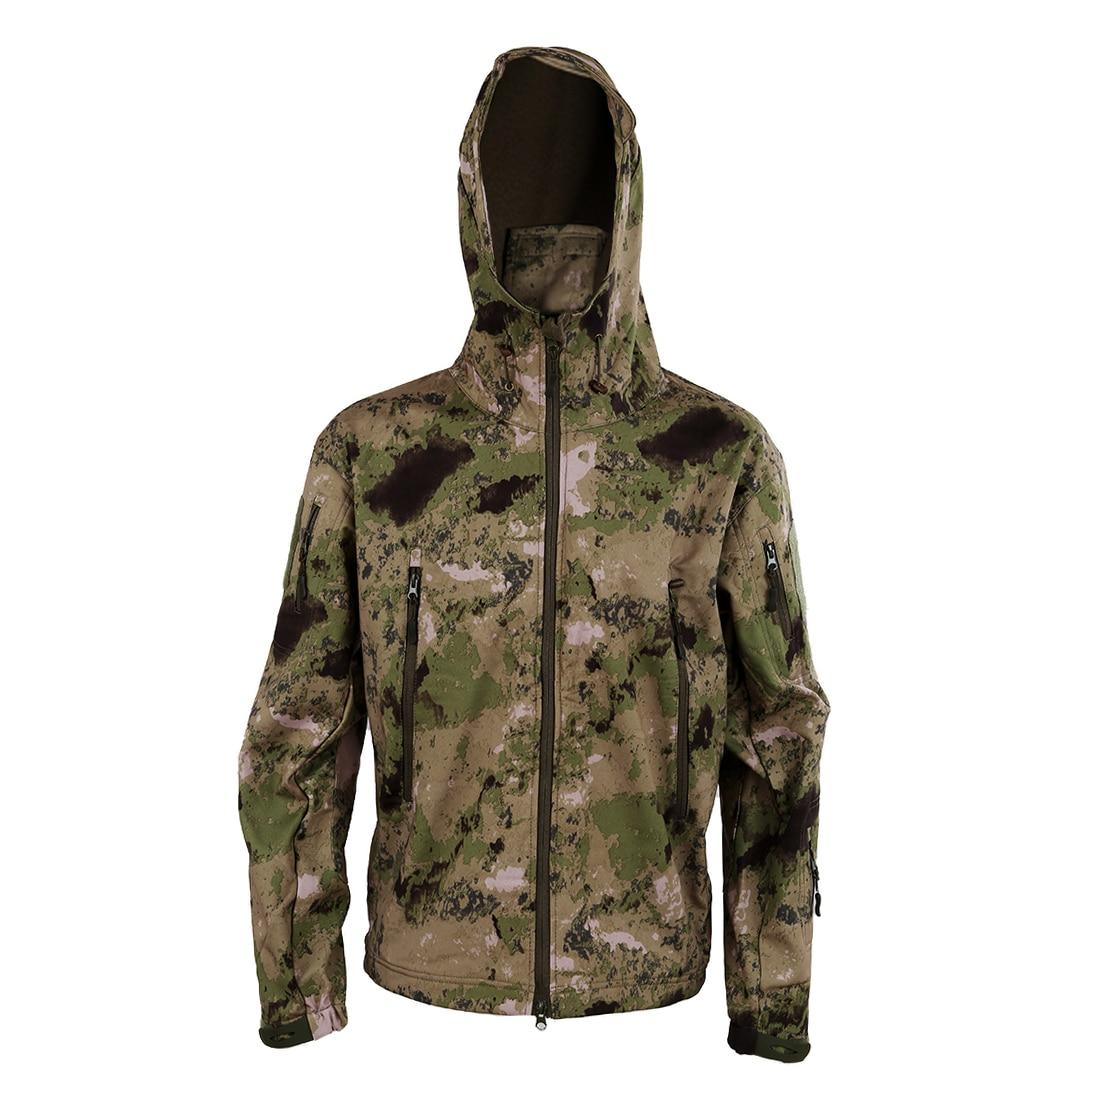 Intellective Men Fleece Waterproof Army Camouflage Hoody Hiking Clothing Set Camo Green/camo Yellow Xs-s-m-l-xl-xxl-xxxl Sports & Entertainment Hiking Jackets